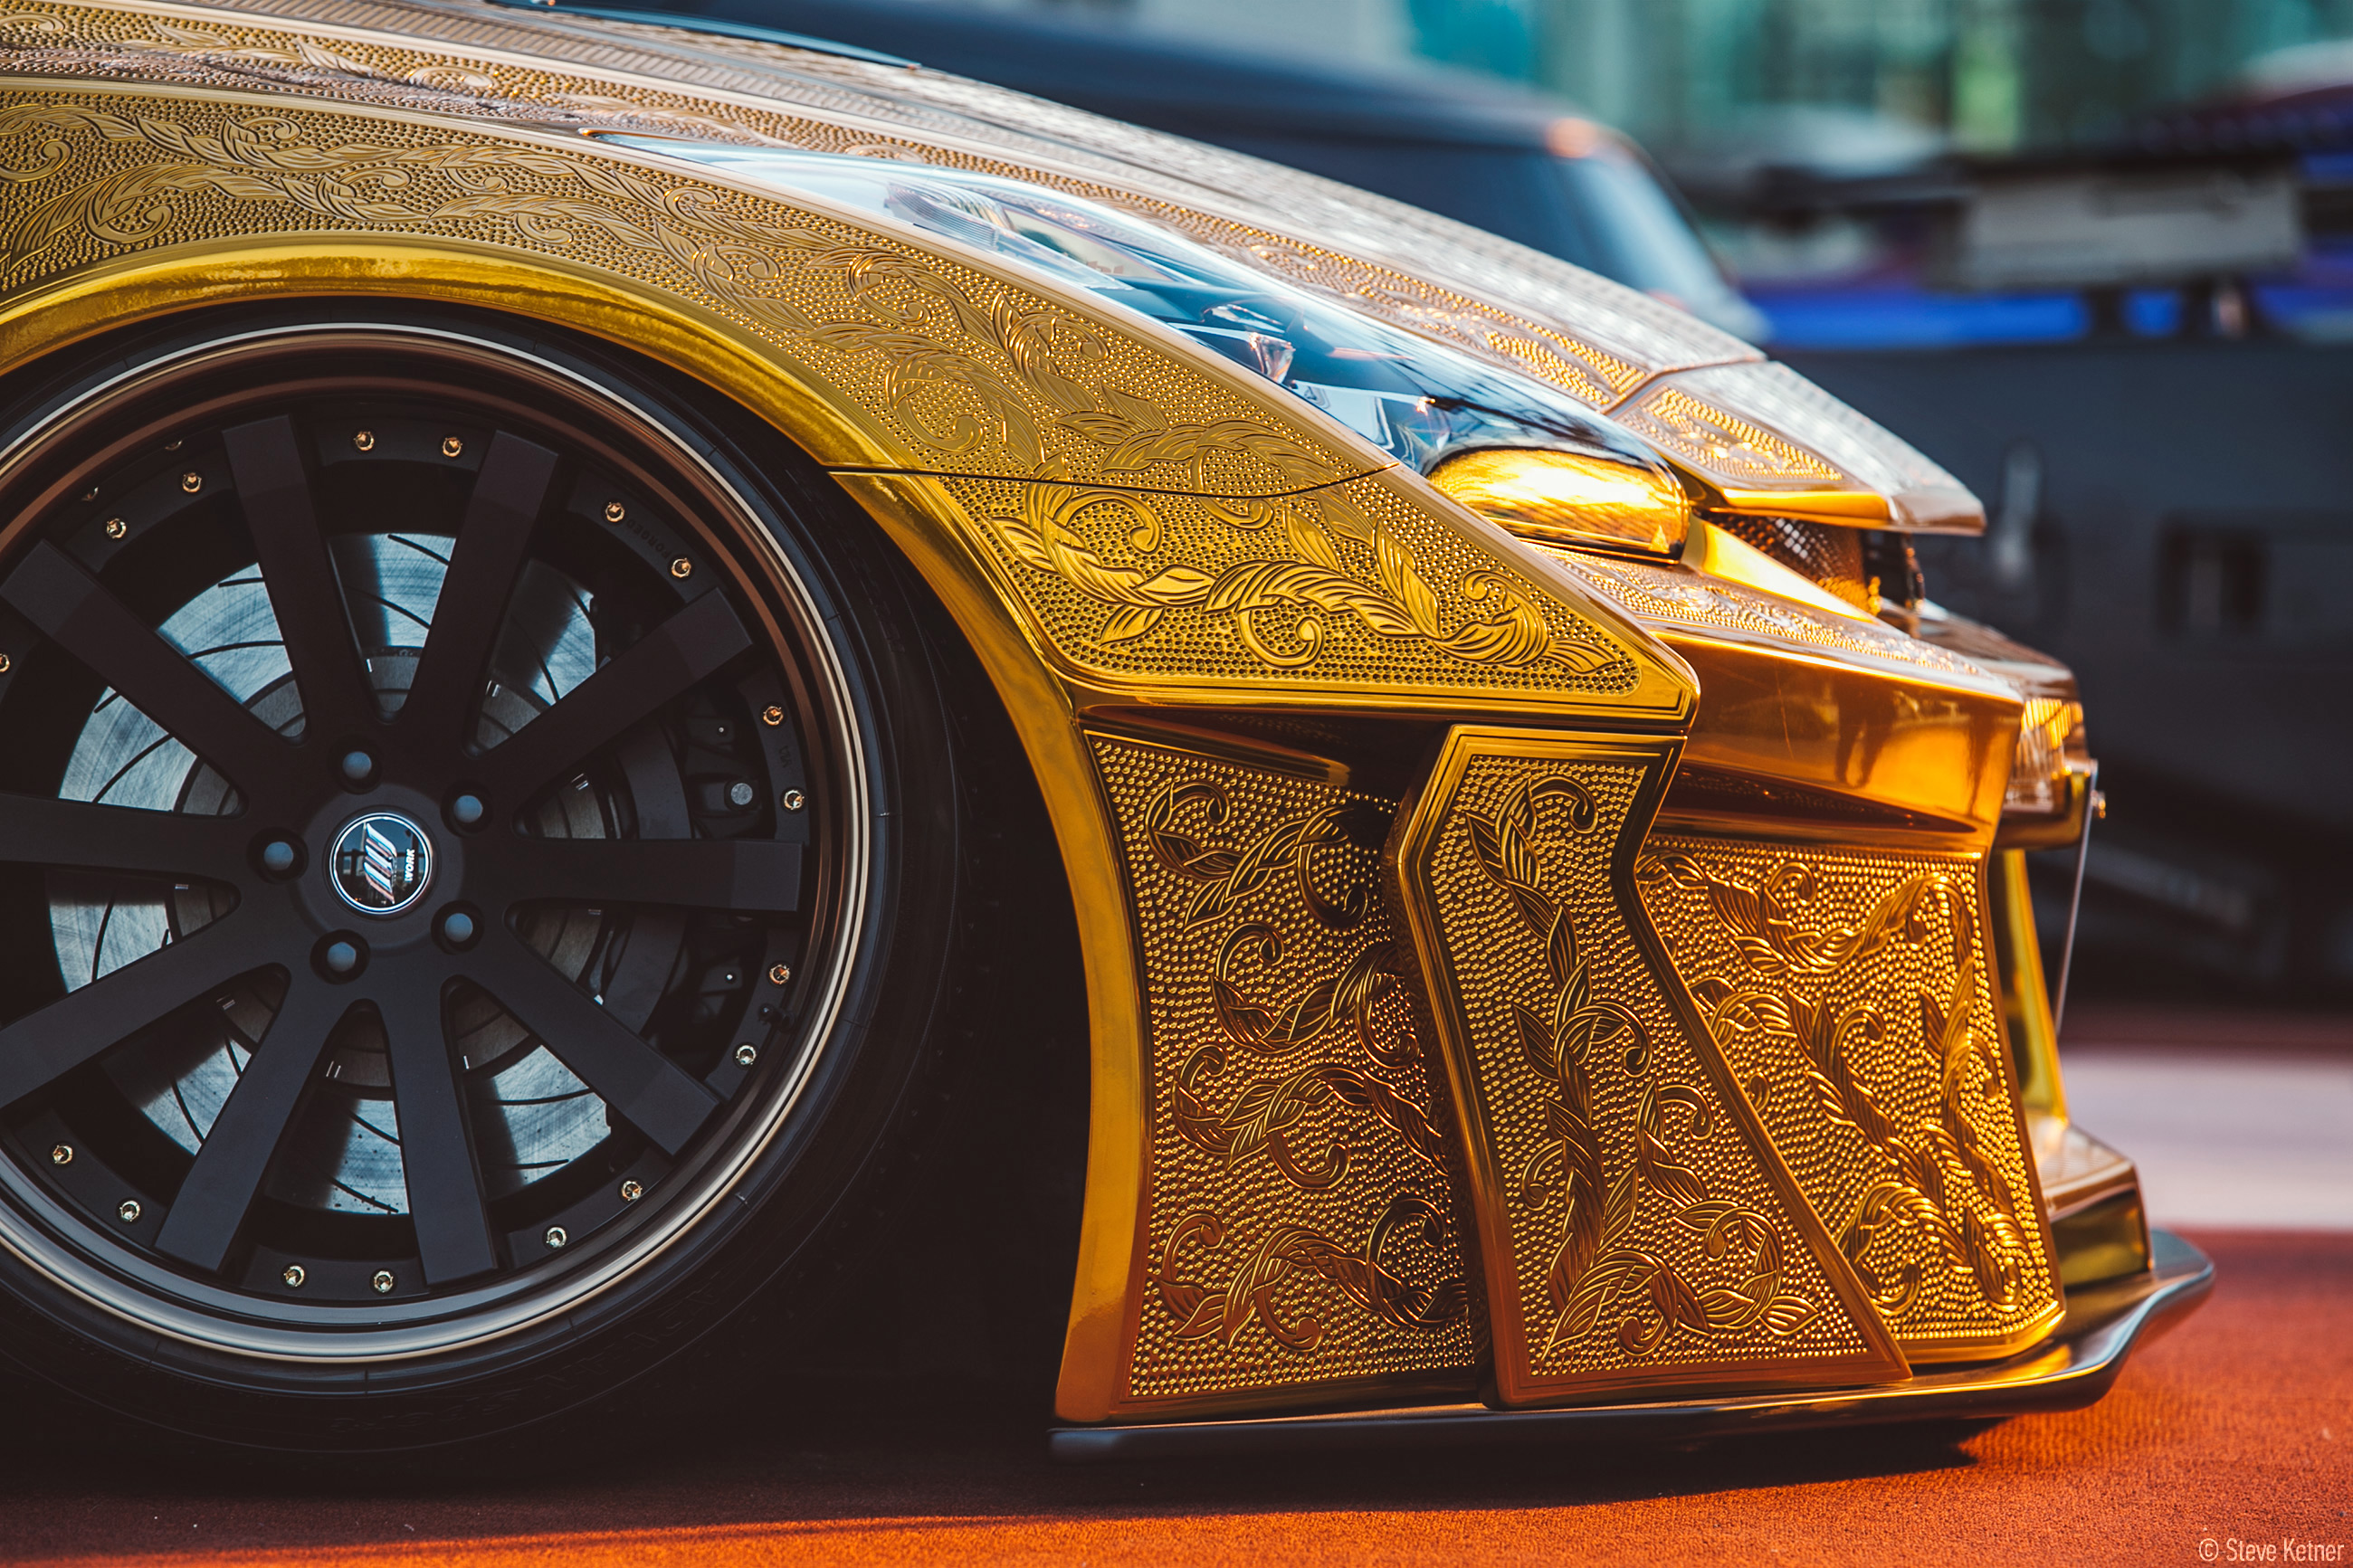 Steve Ketner - Nissan R35 GT-R by Kuhl-racing - kuhl-racing.com